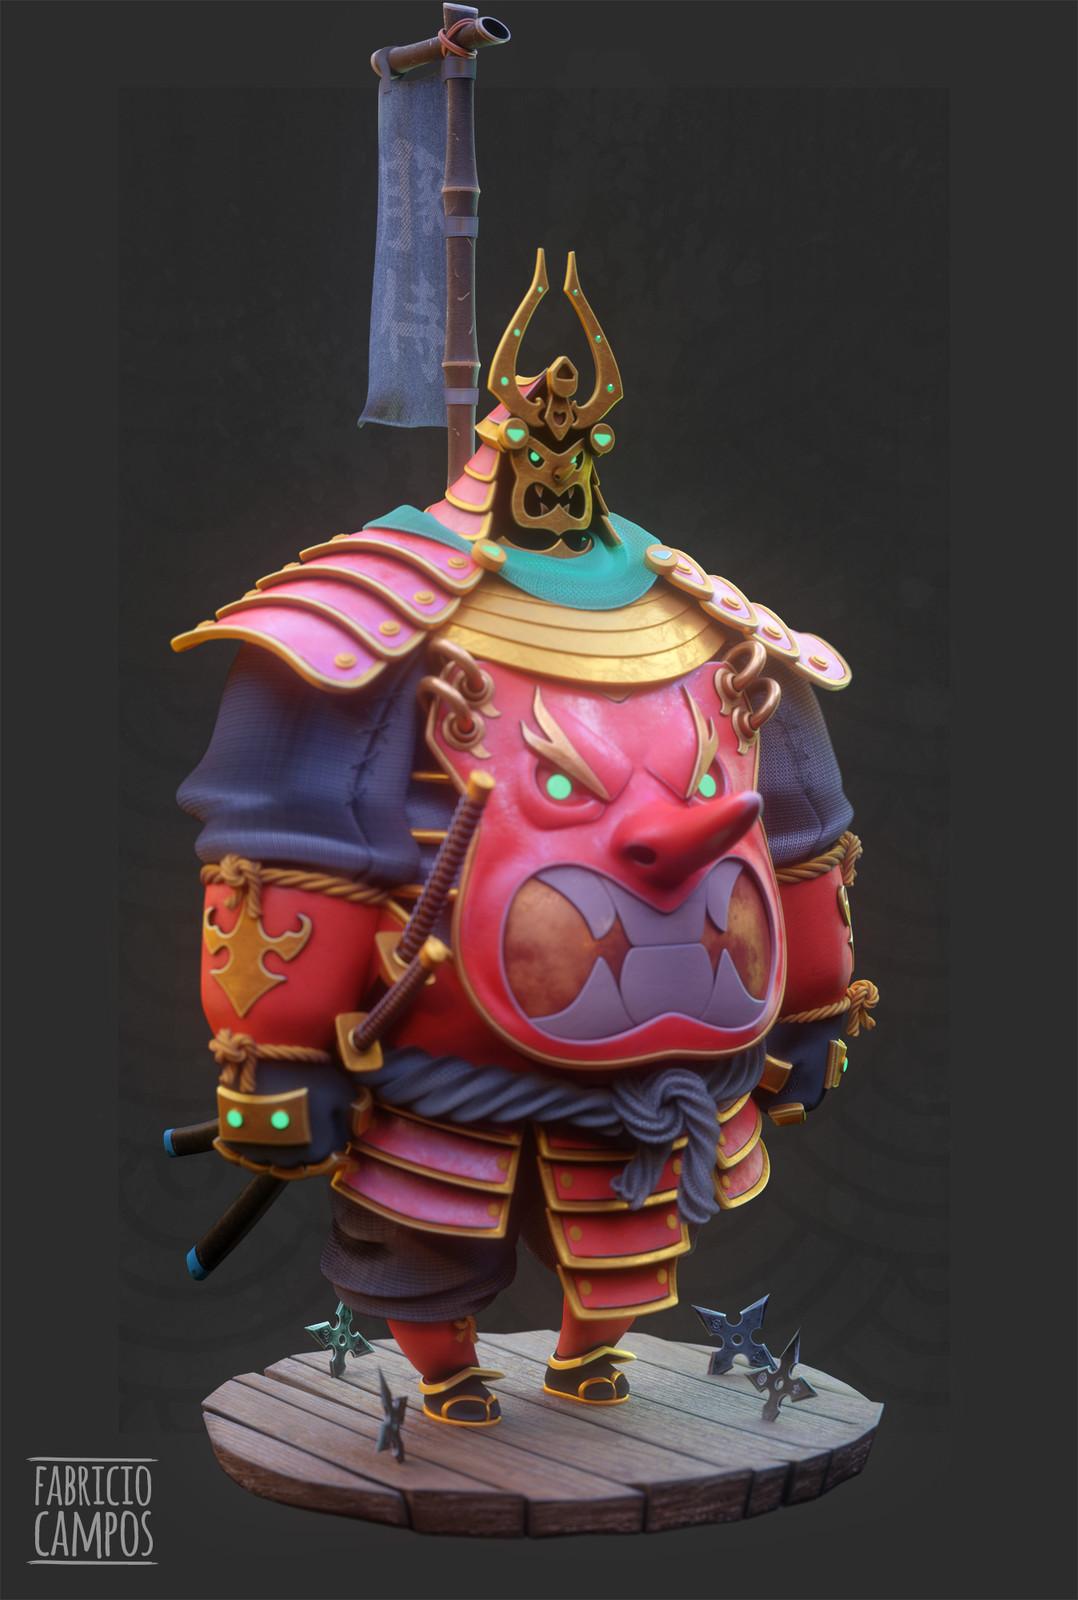 Chubby Samurai